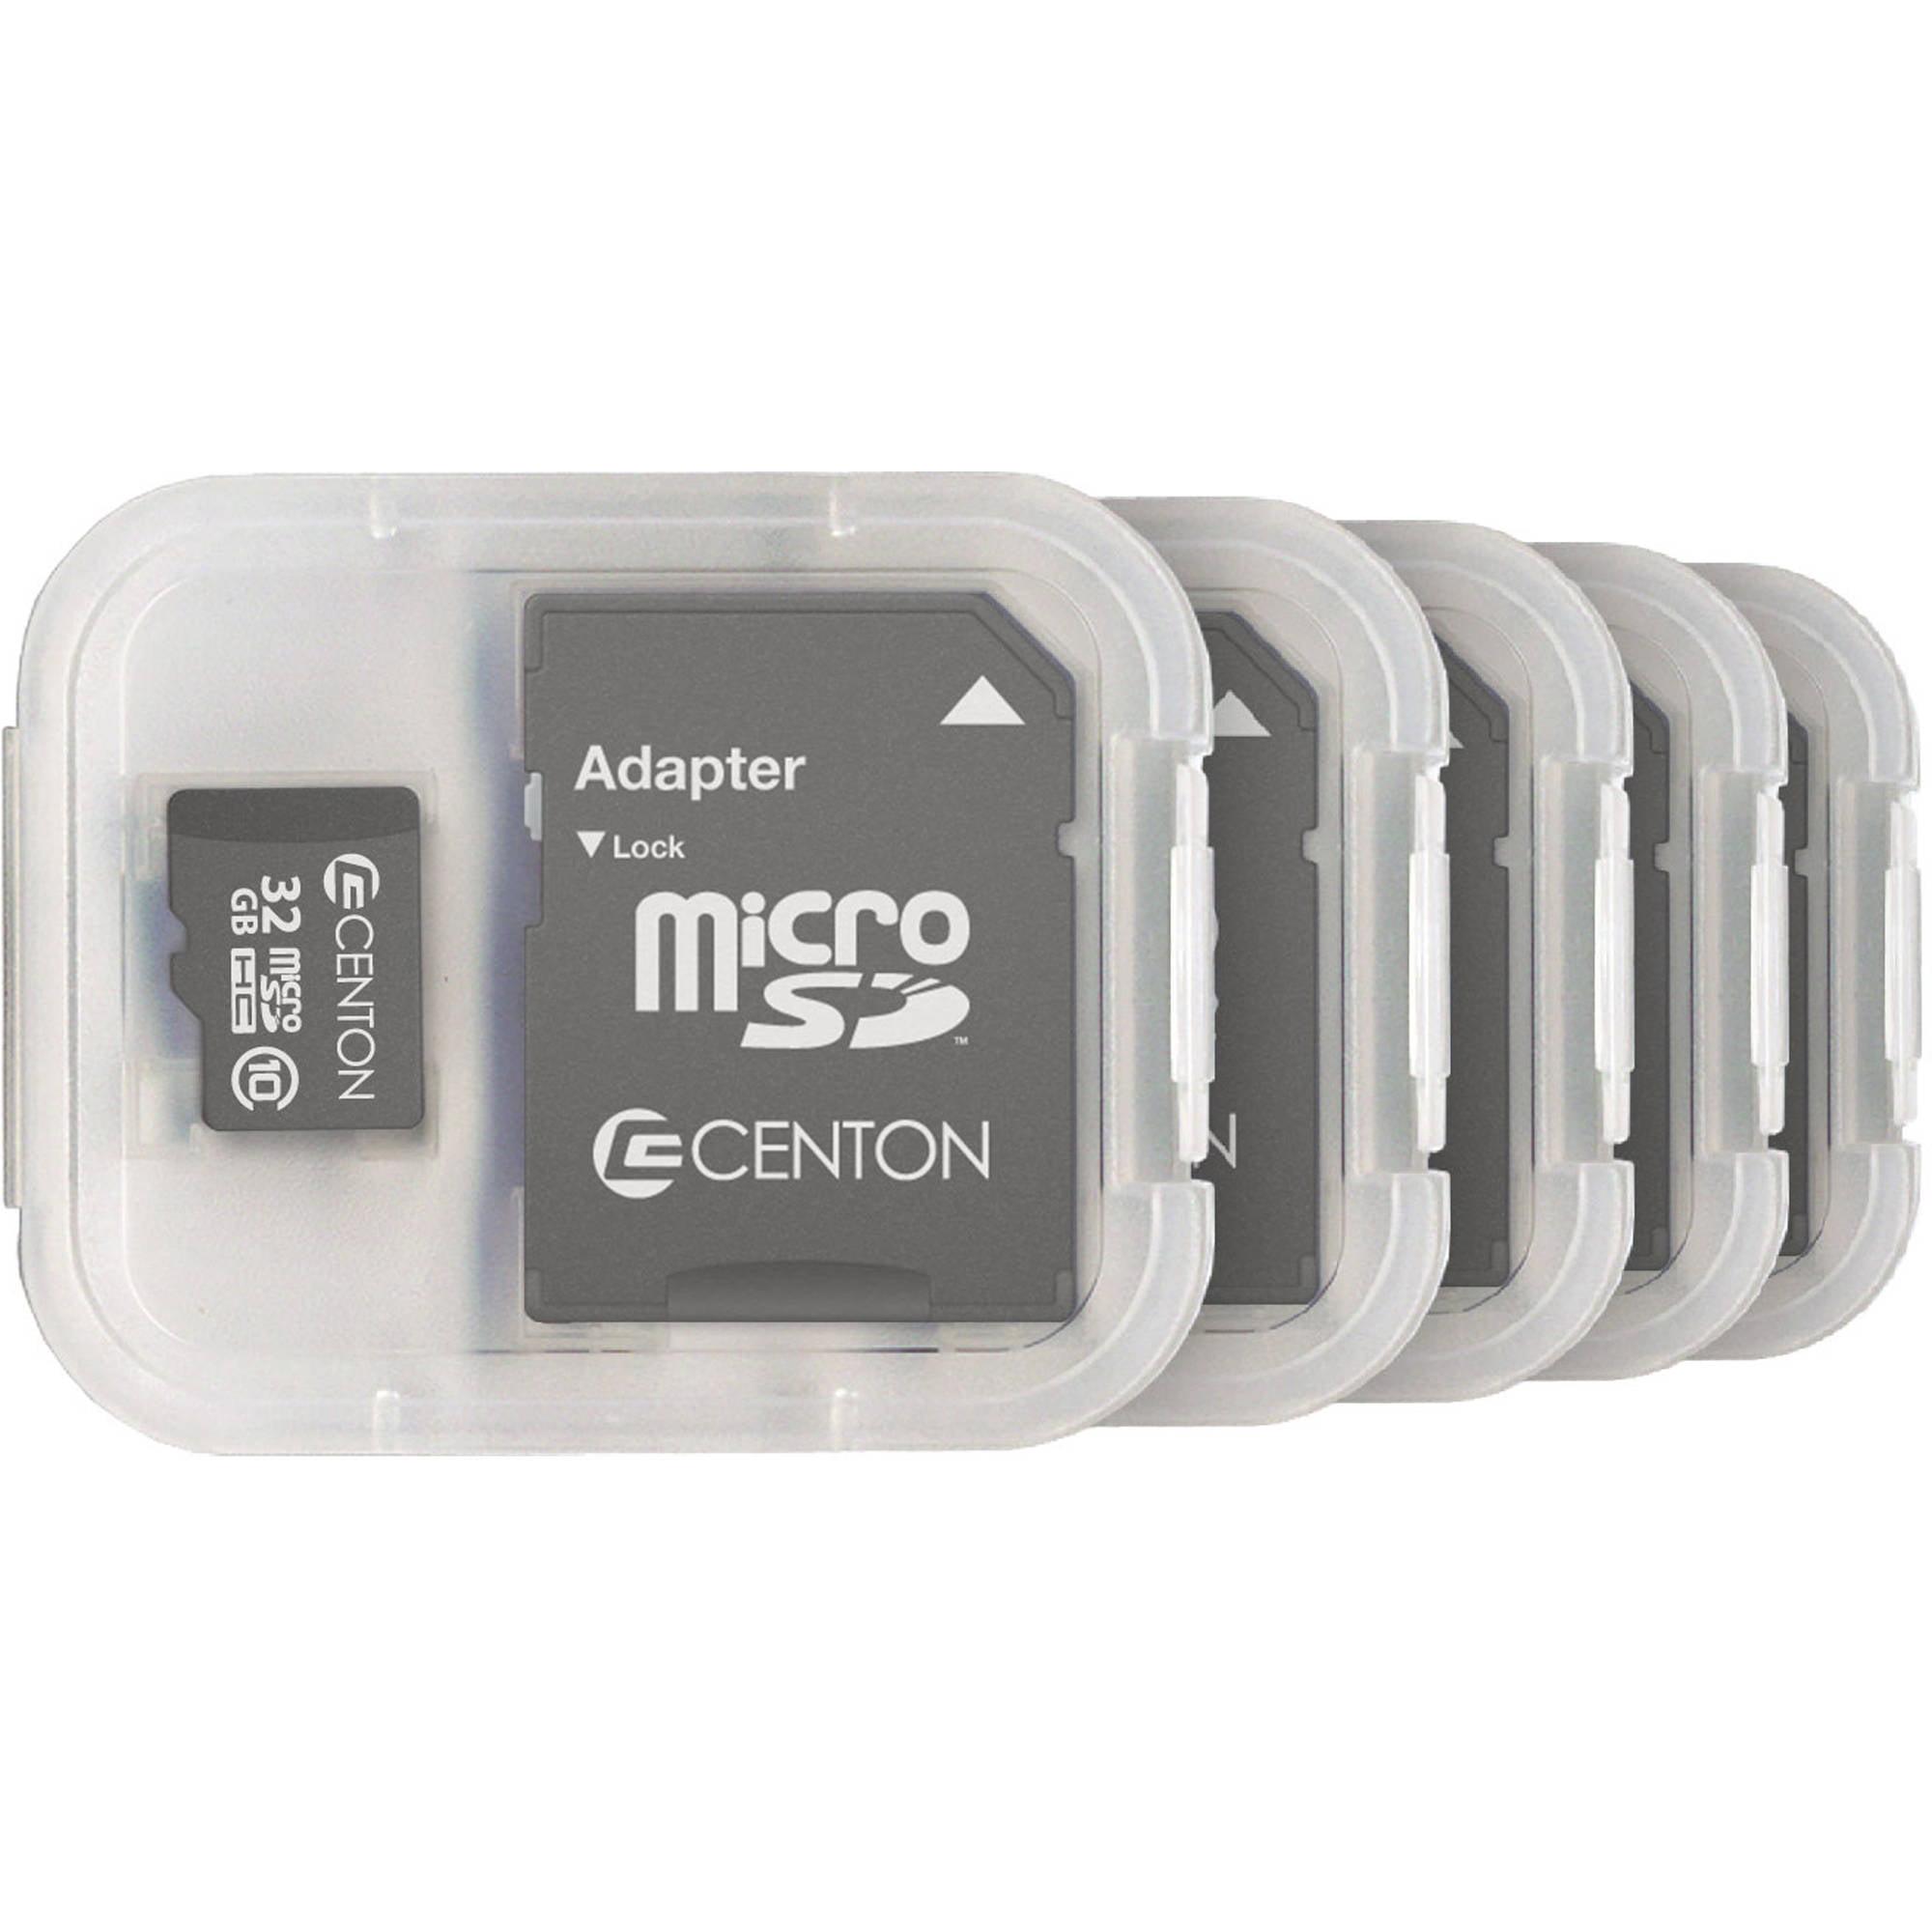 Centon MP Essential 32GB Class 10 microSDHC Card, 5pk